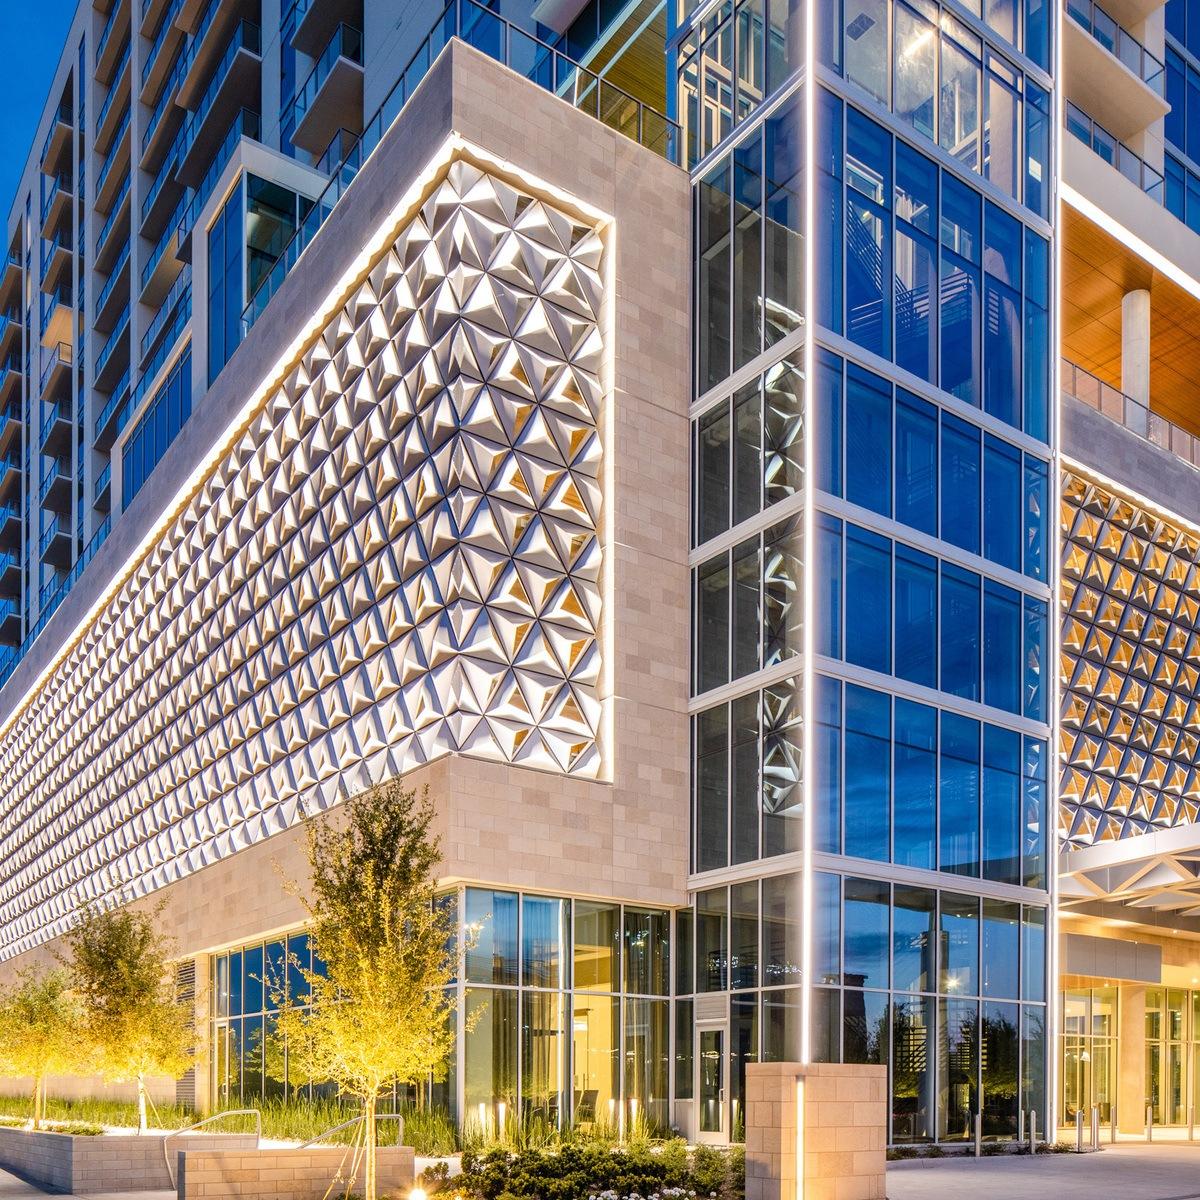 luxury multi-family architecture example